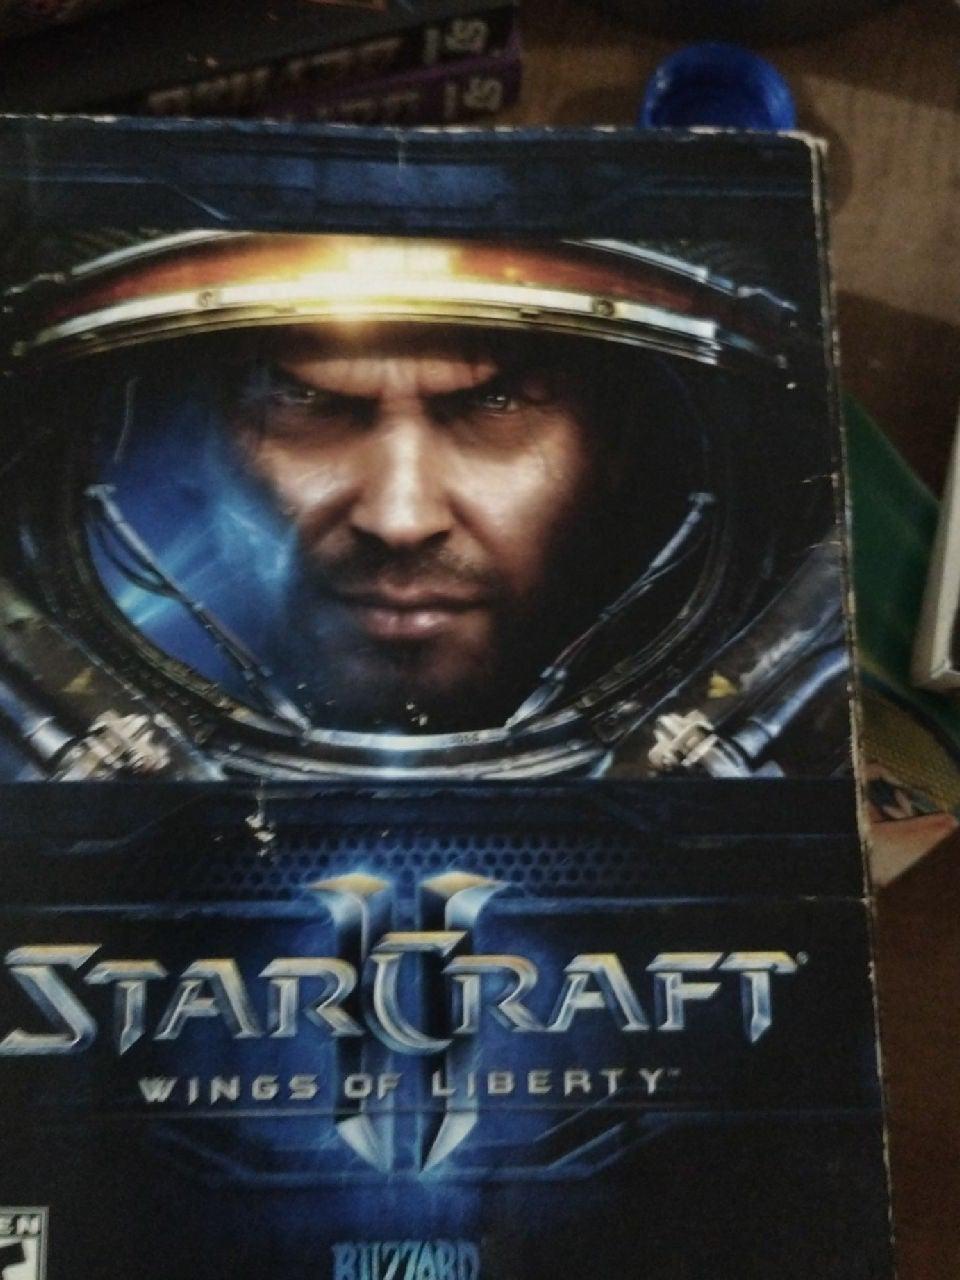 Star craft PC game